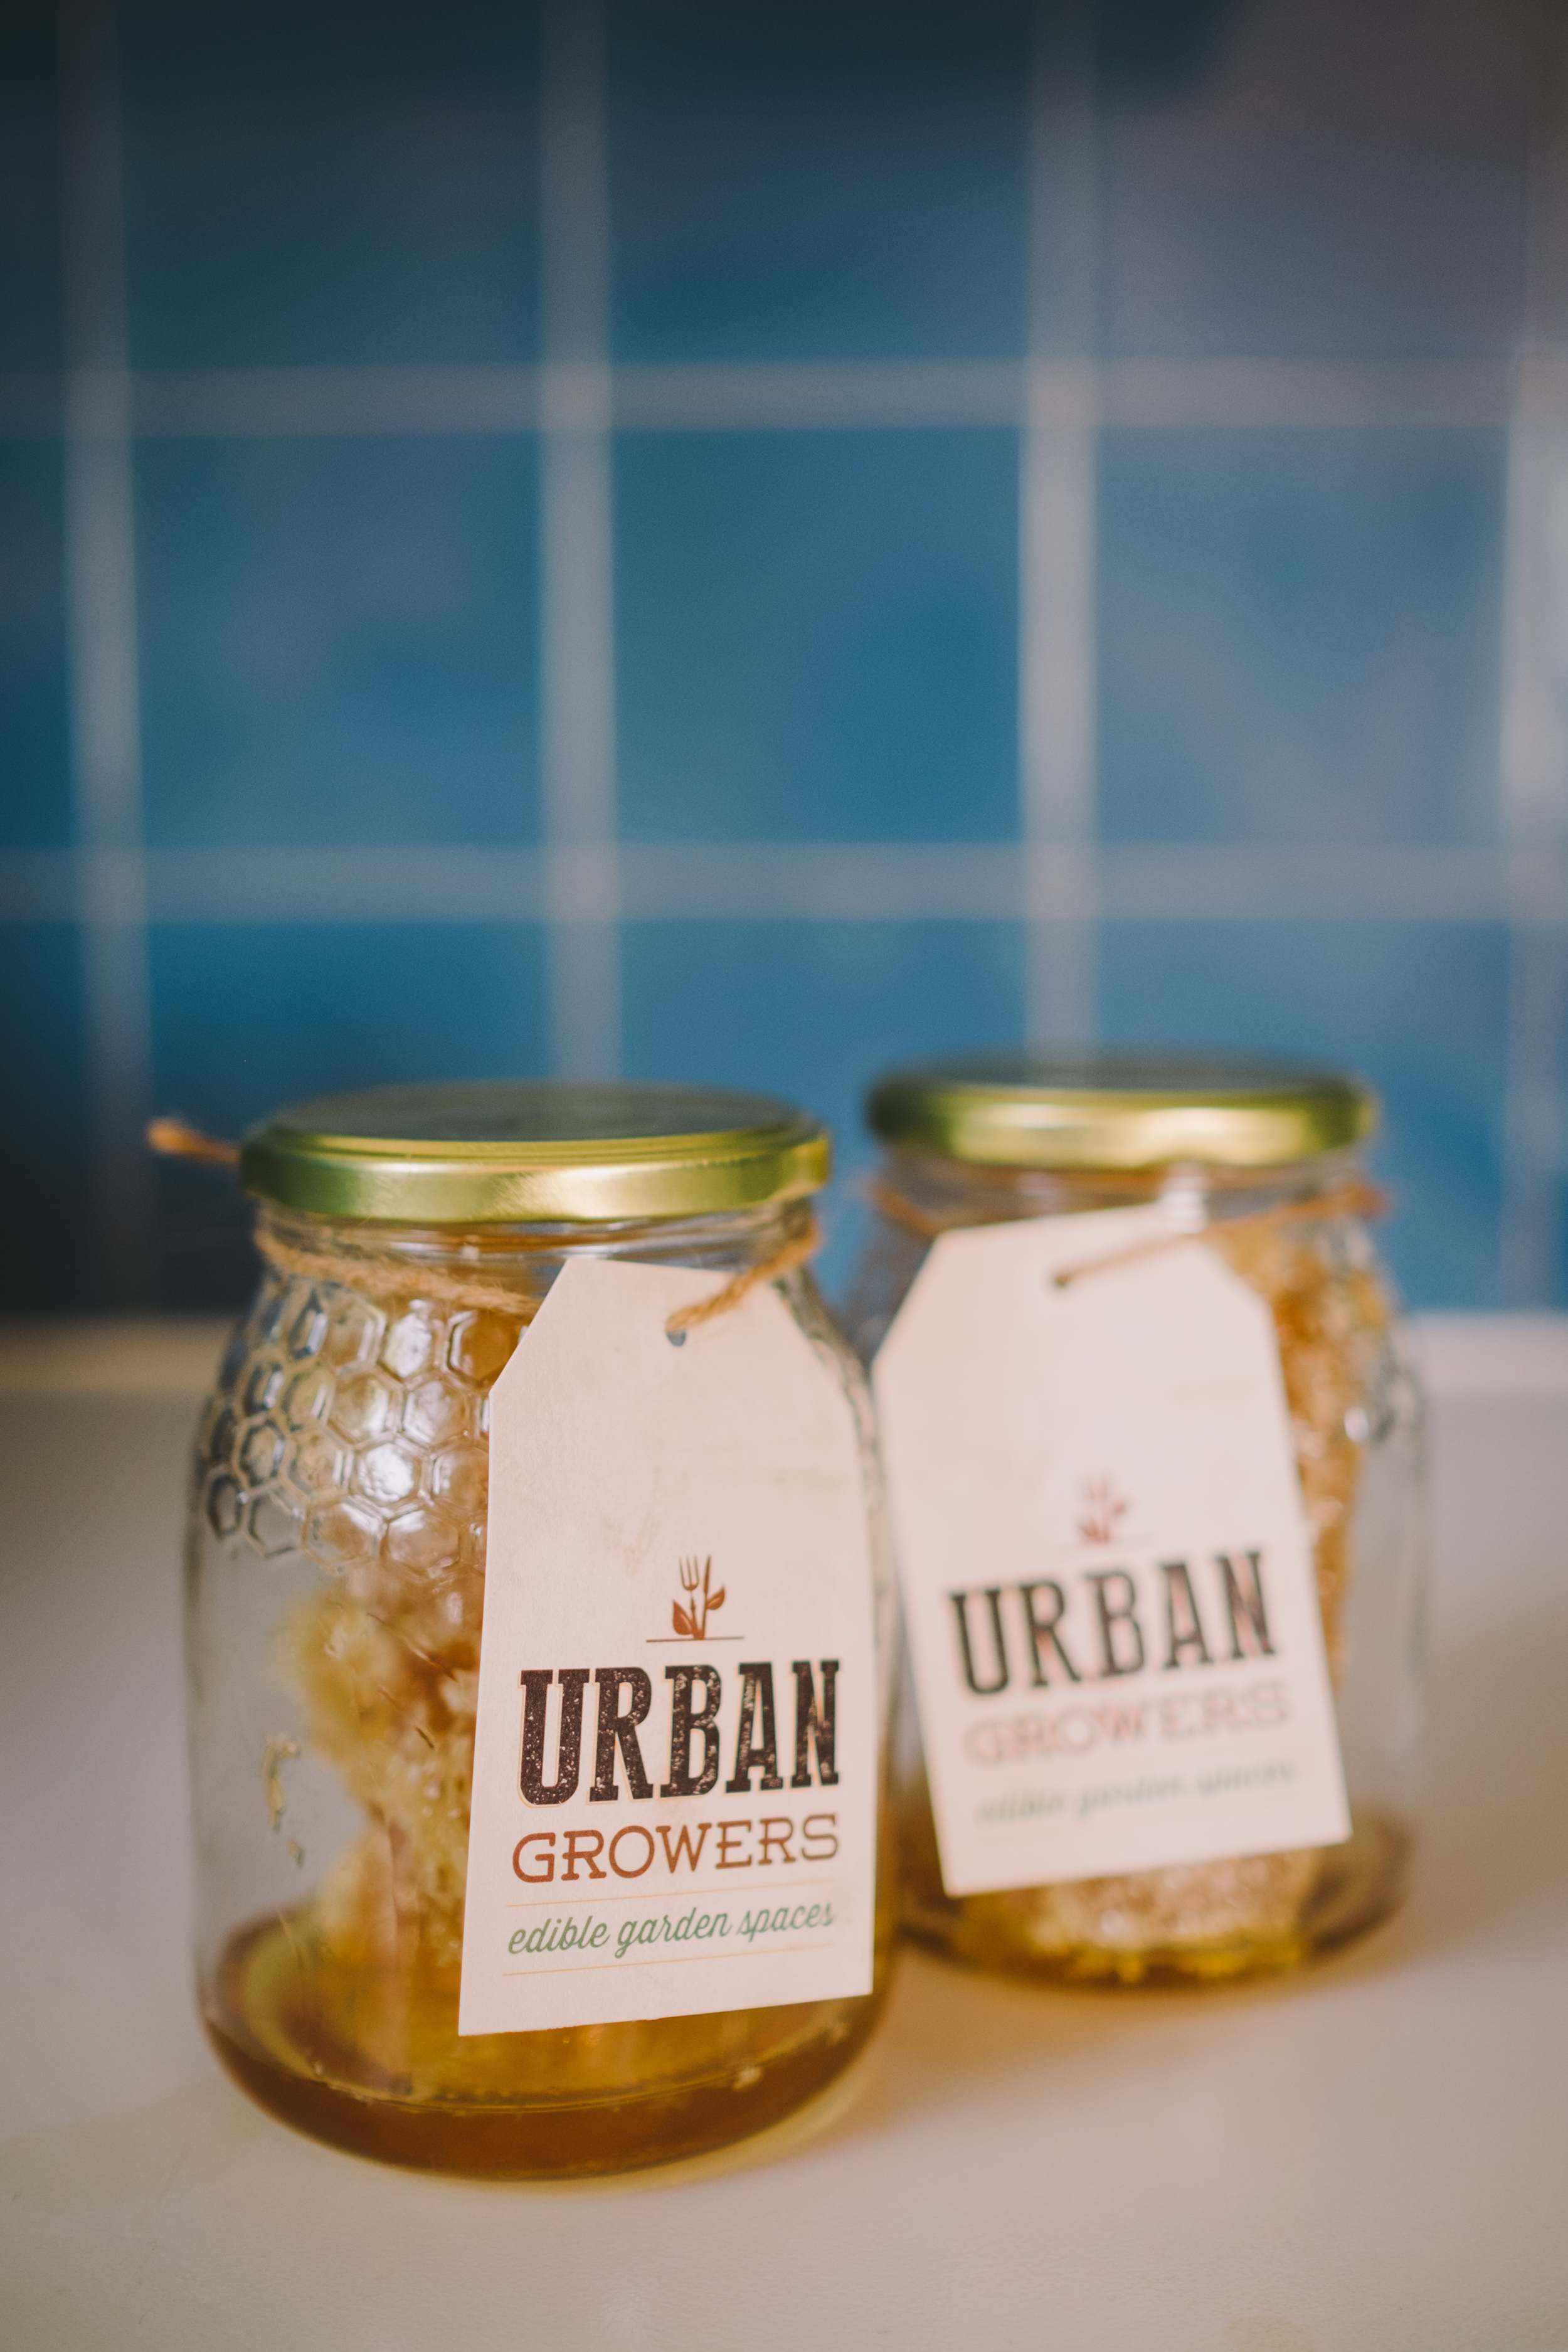 UrbanGrowers2016.03.04-008.jpg